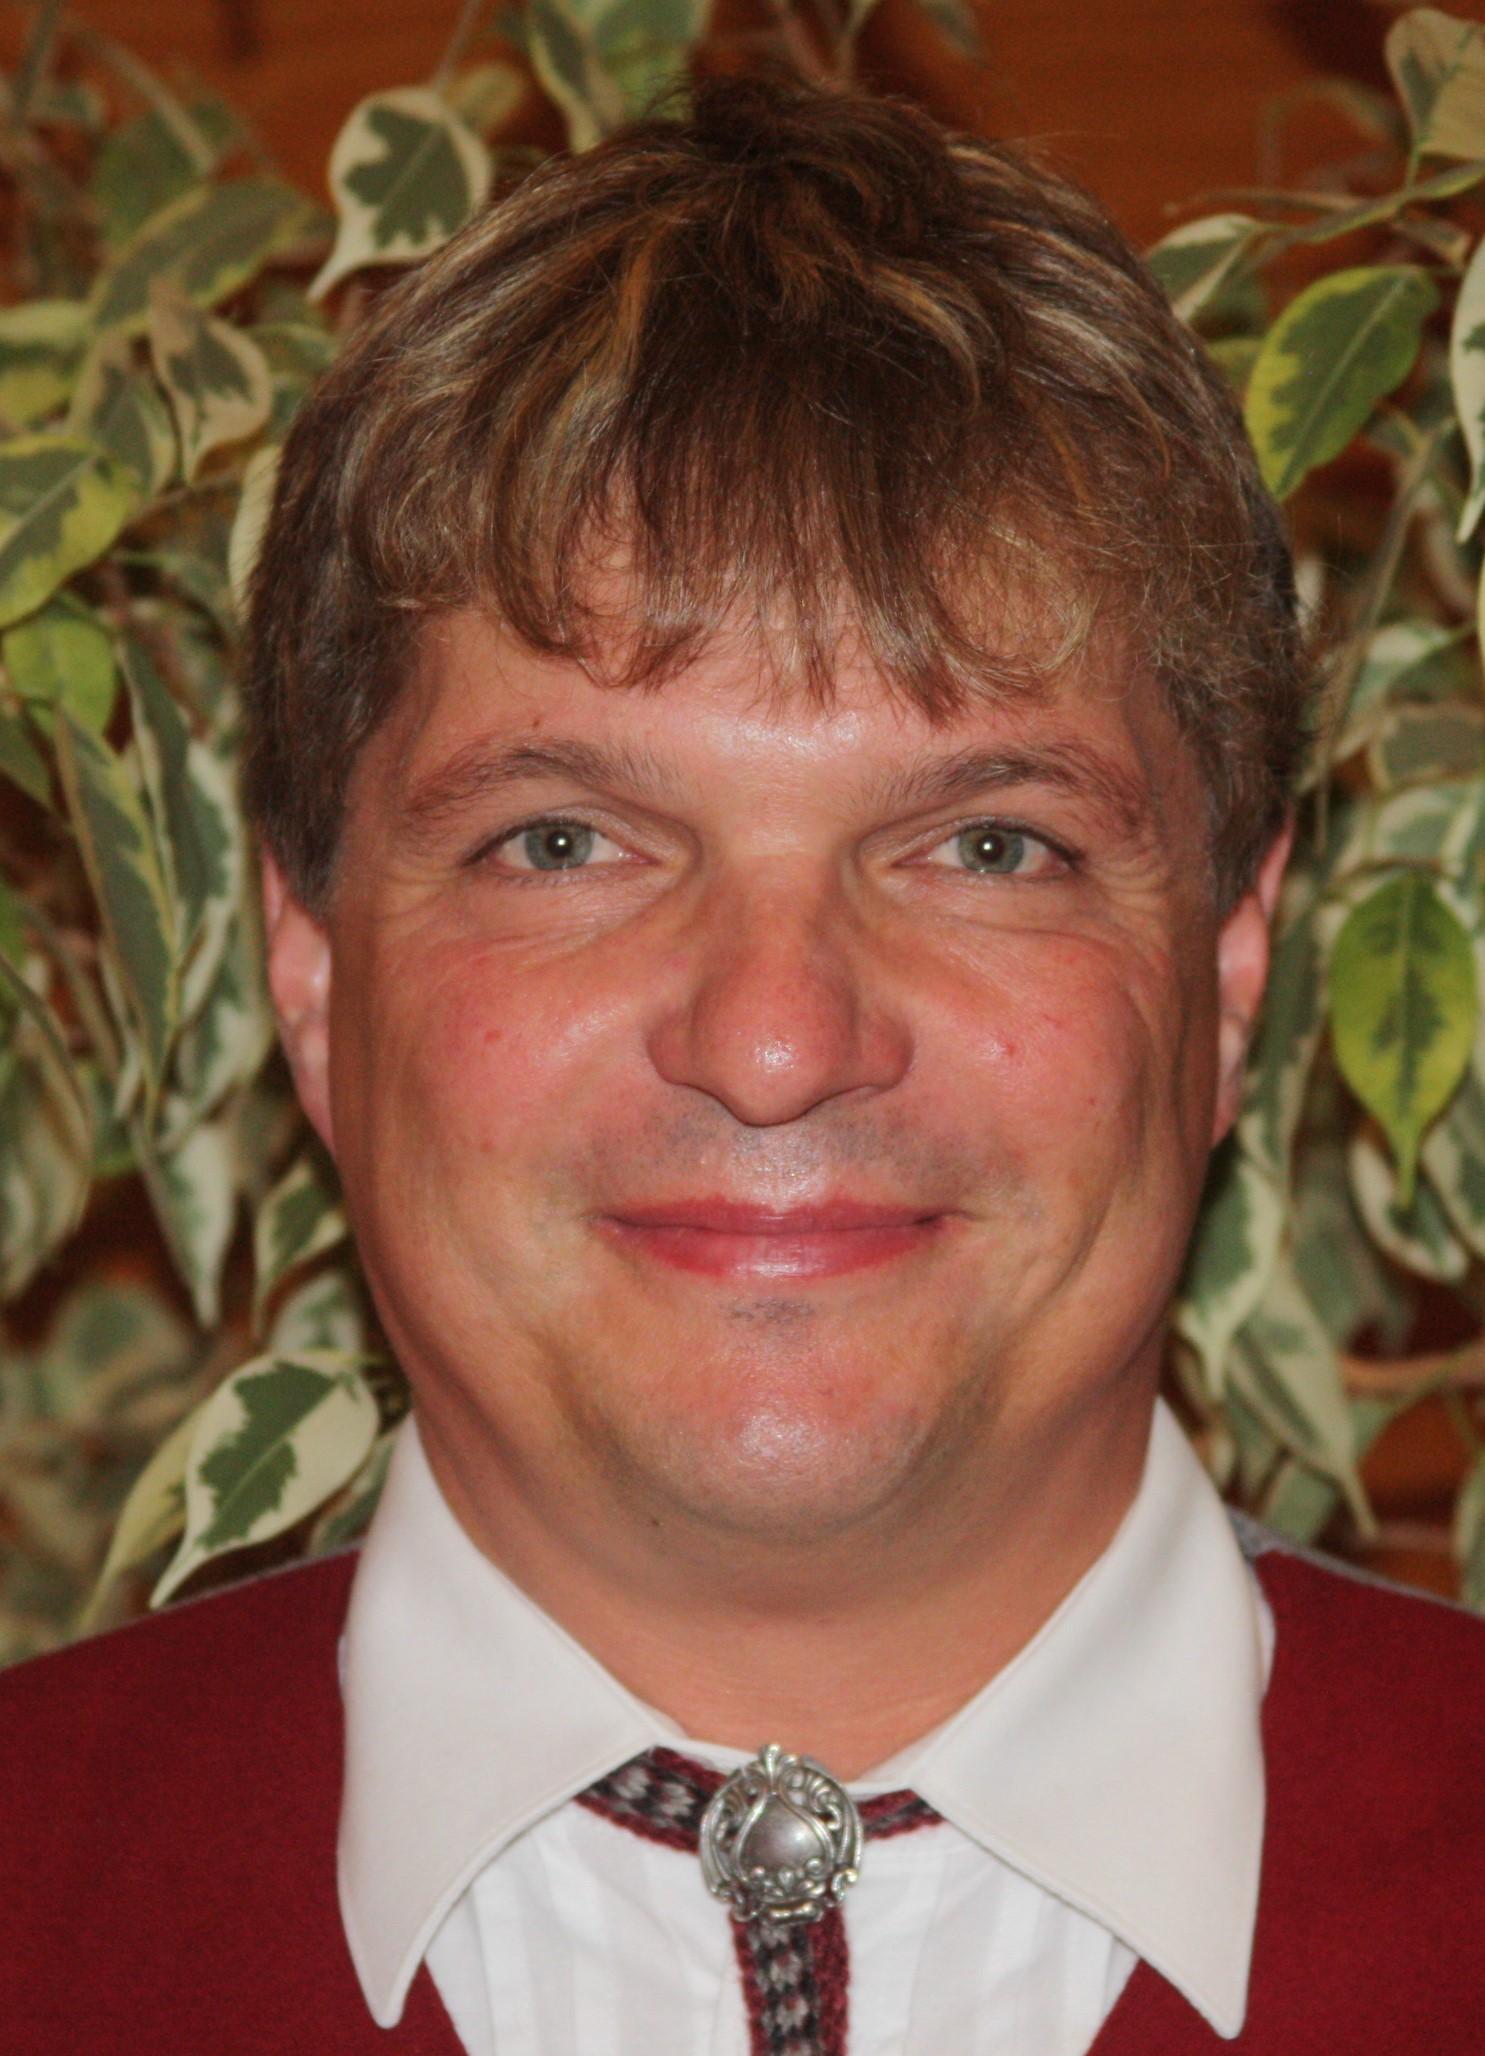 Gerald Mössler